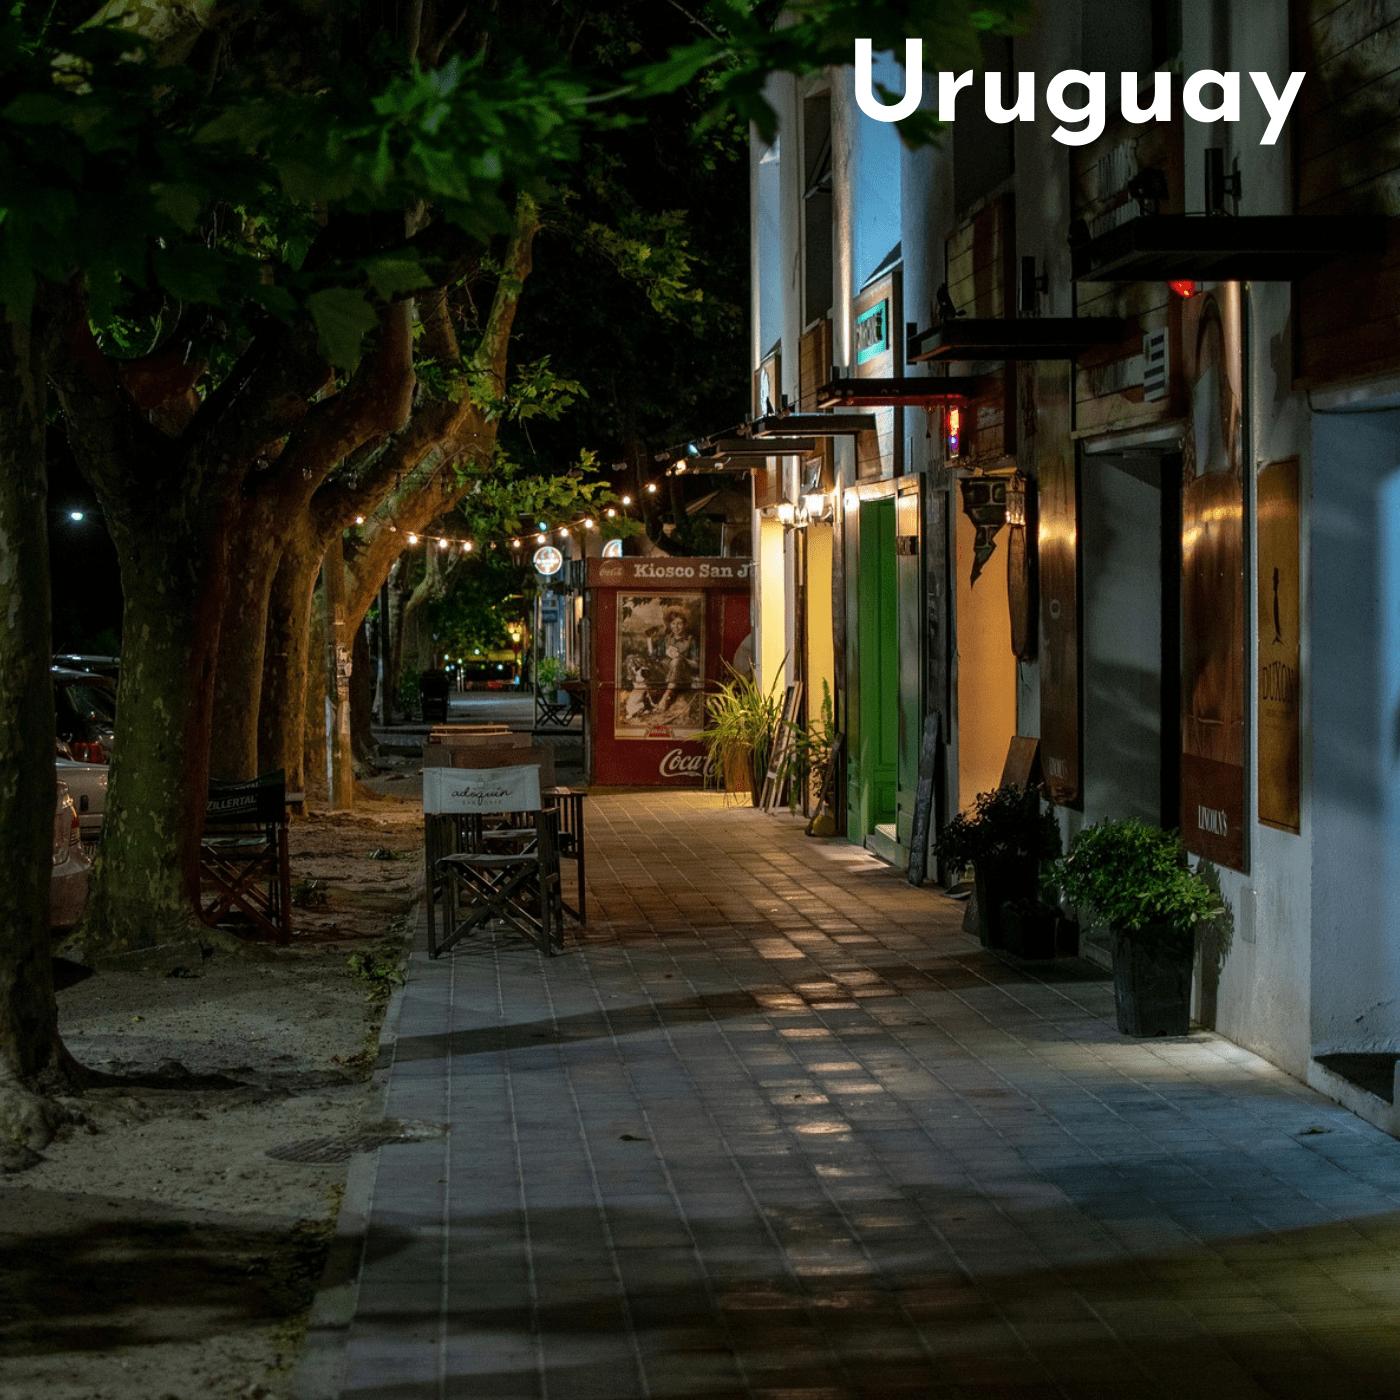 Uruguay Bucket List